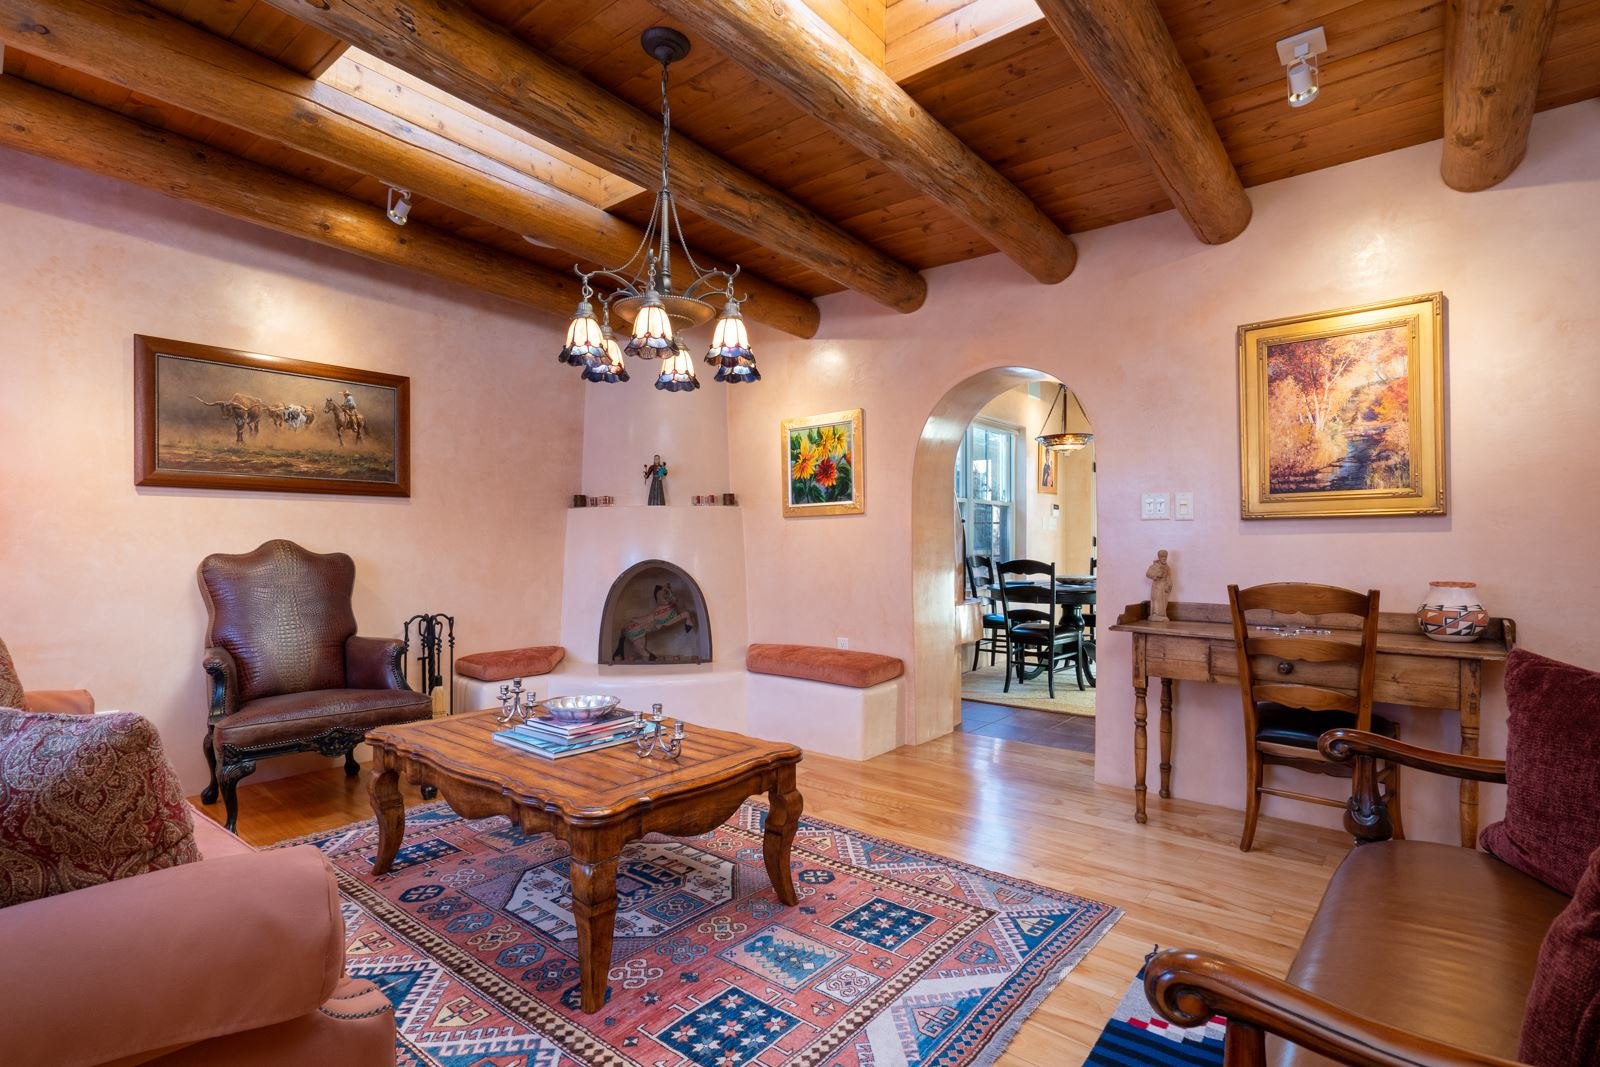 808 Galisteo Street, Santa Fe, New Mexico 87505, 4 Bedrooms Bedrooms, ,4 BathroomsBathrooms,Single Family,For Sale,808 Galisteo Street,202100093